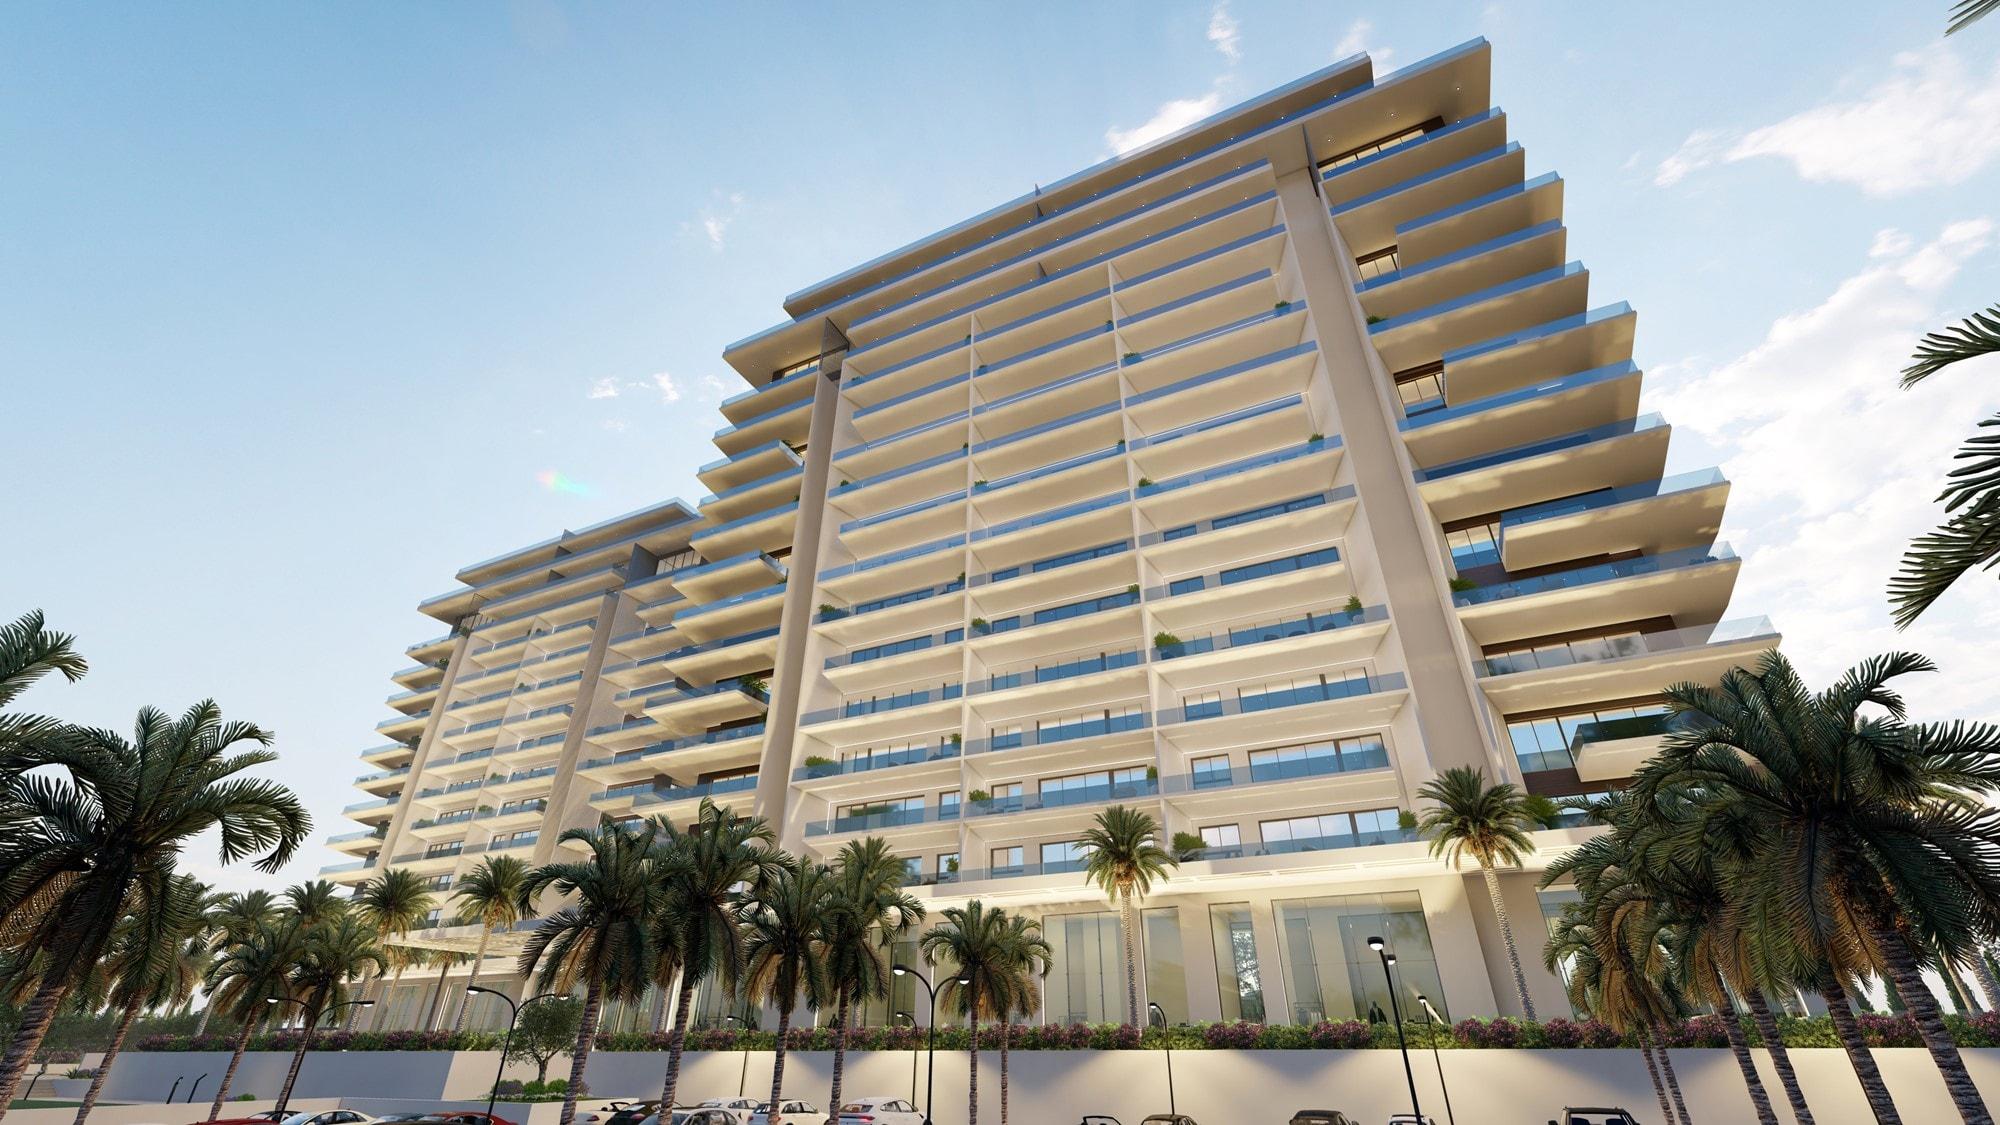 Apartment in Kato Paphos  121 SqMt 2 Bedrooms 2 Bathrooms Fo.....